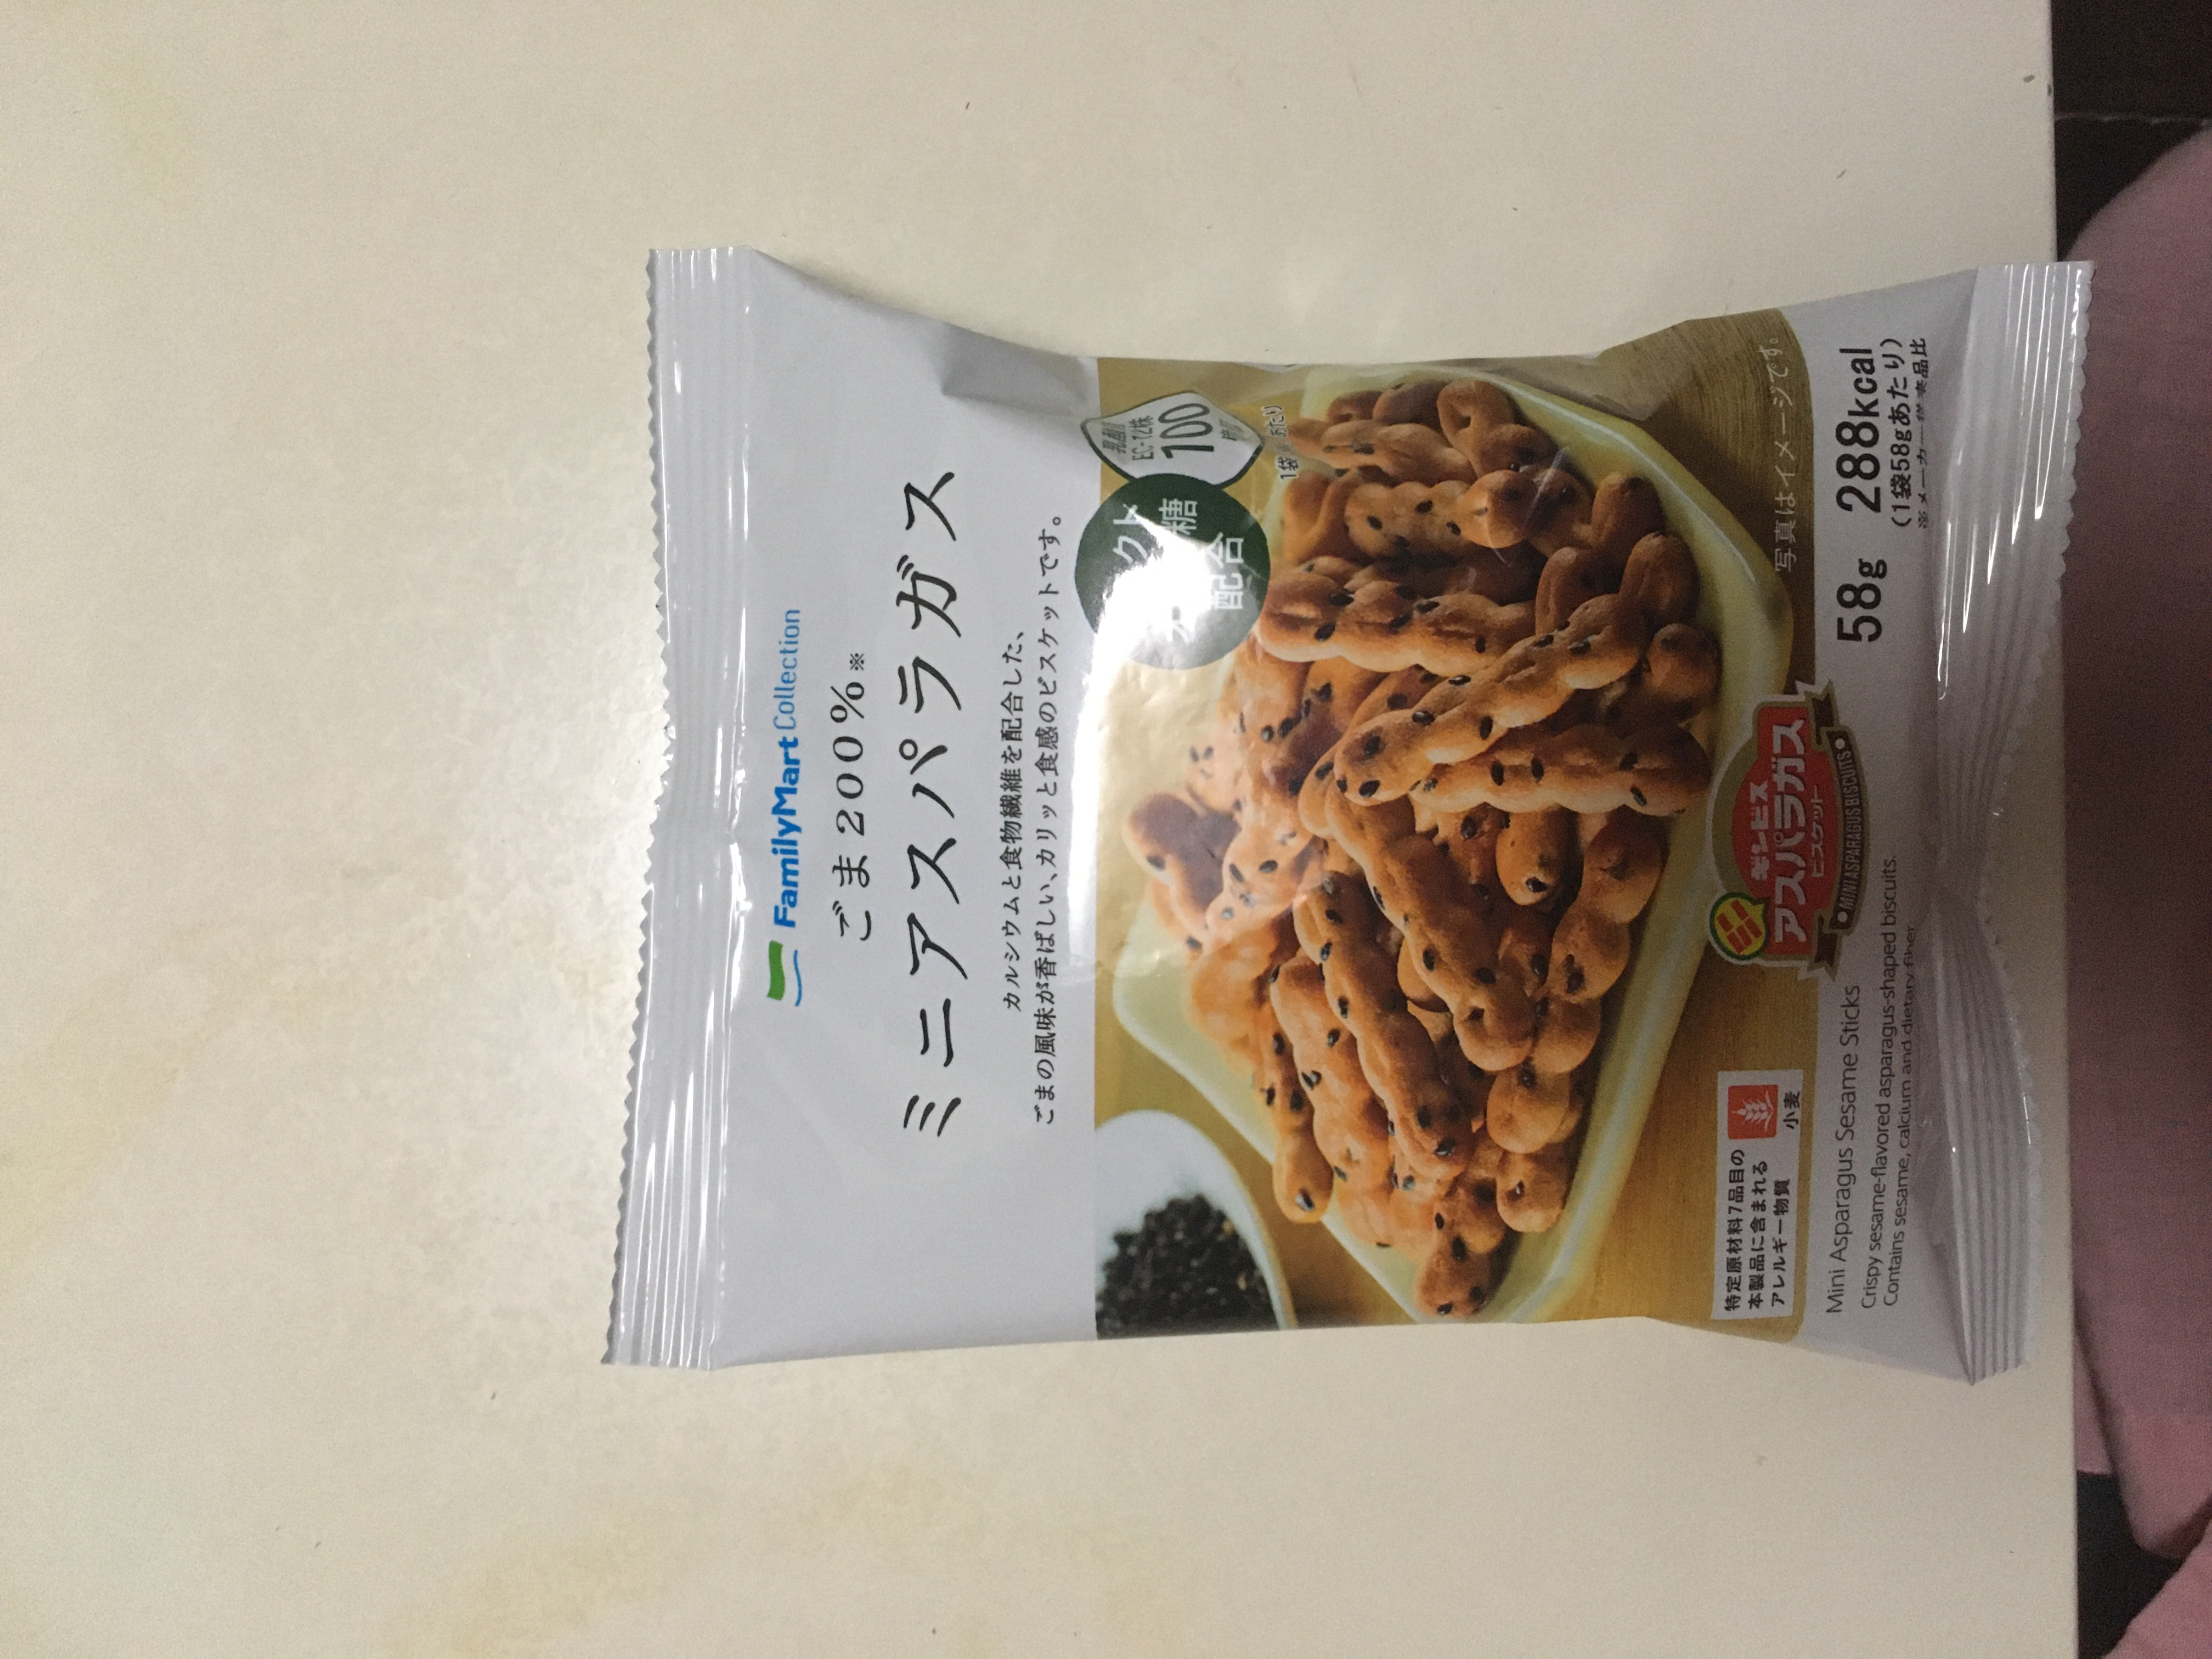 Thumbnail of うまいコンビニお菓子